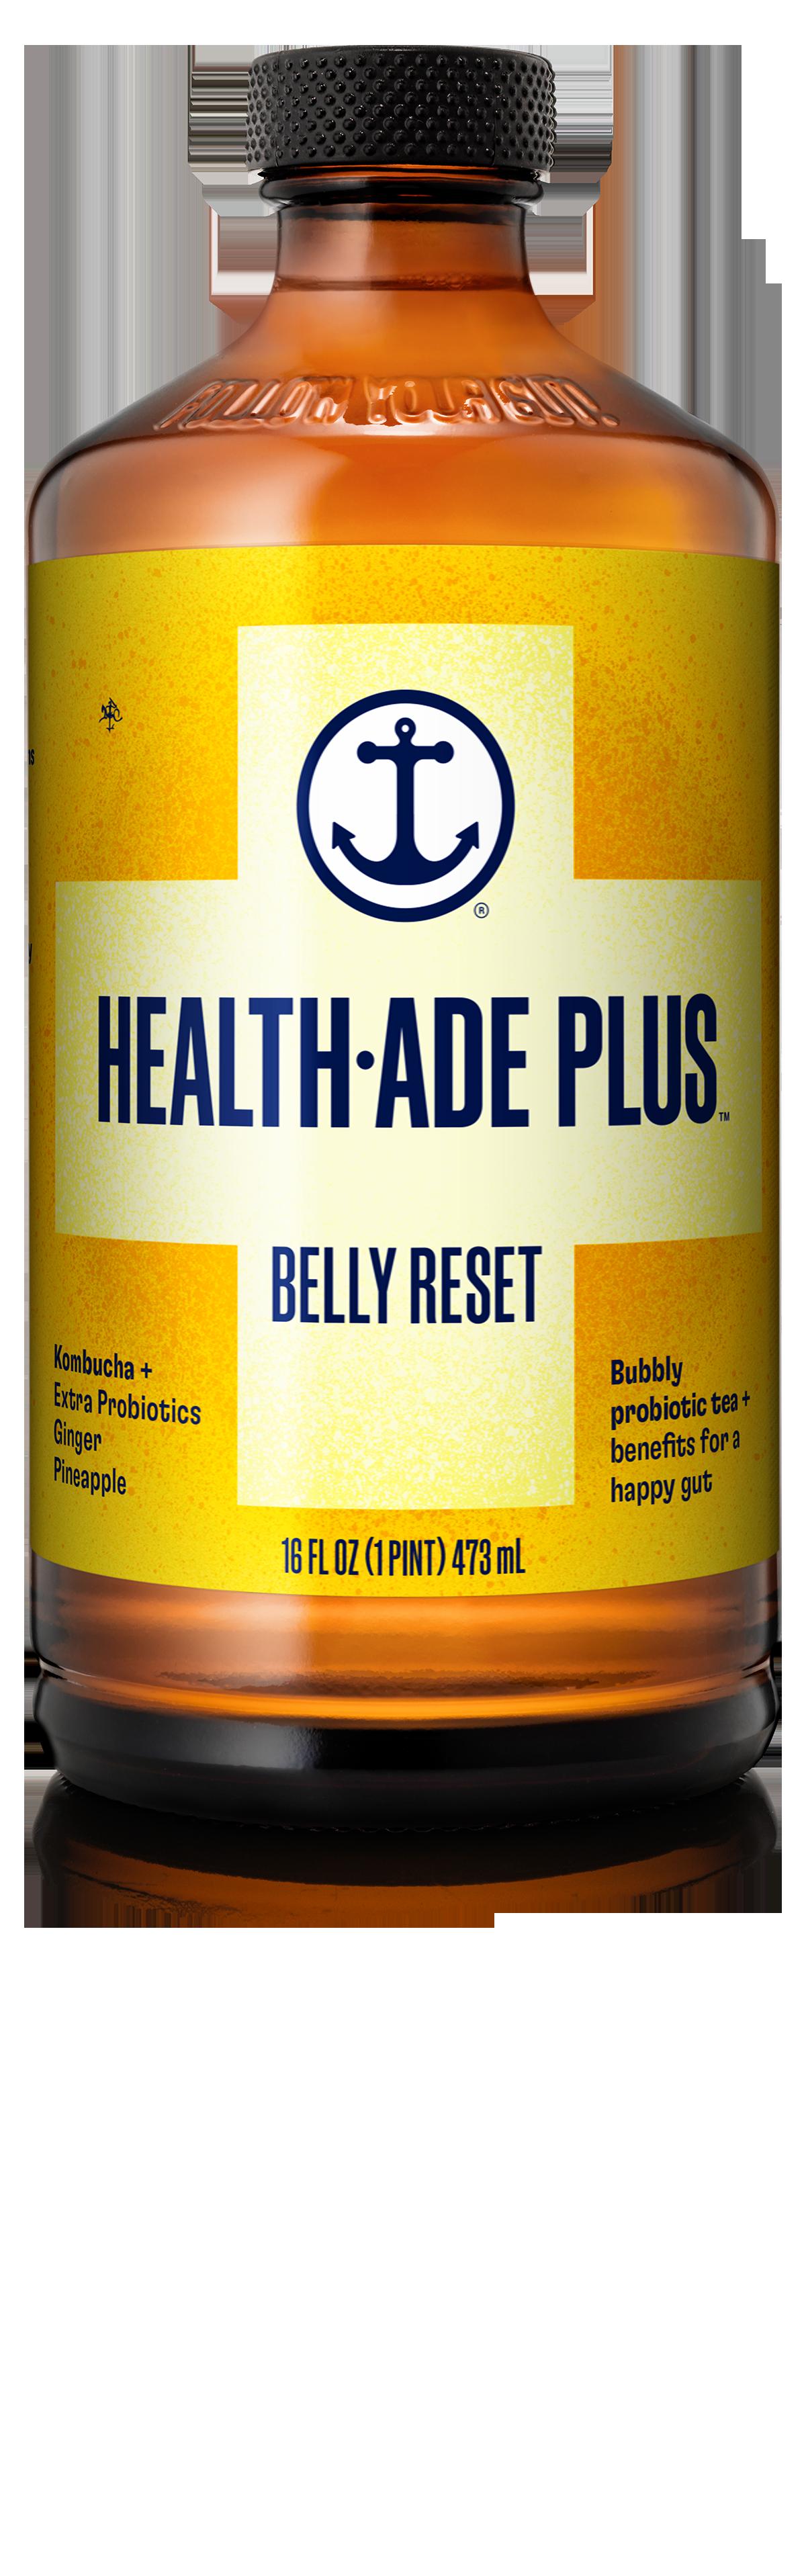 Health-Ade PLUS Belly Reset